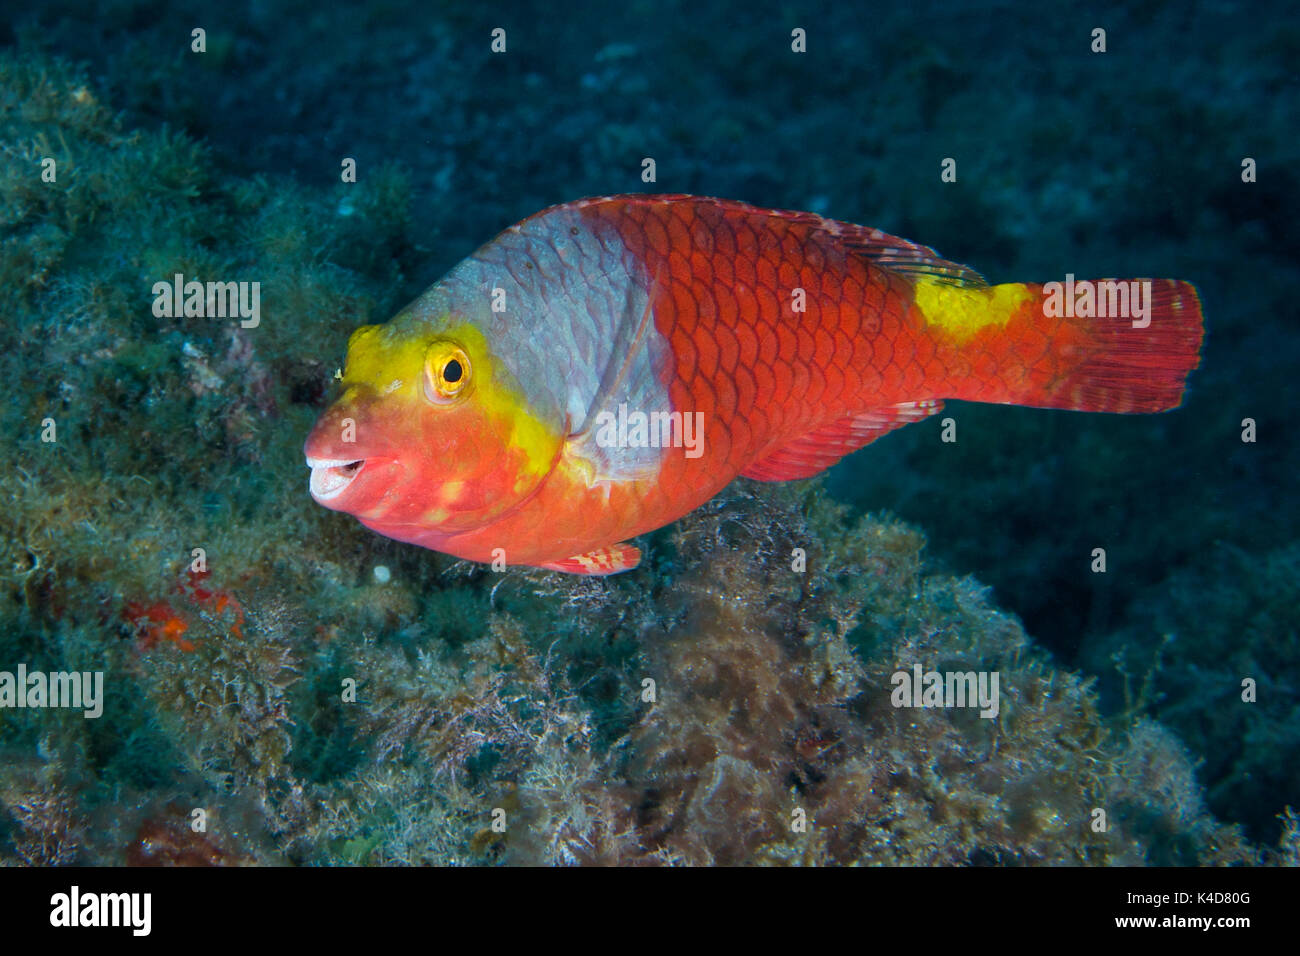 Mediterranean Parrotfish Stock Photos & Mediterranean Parrotfish ...